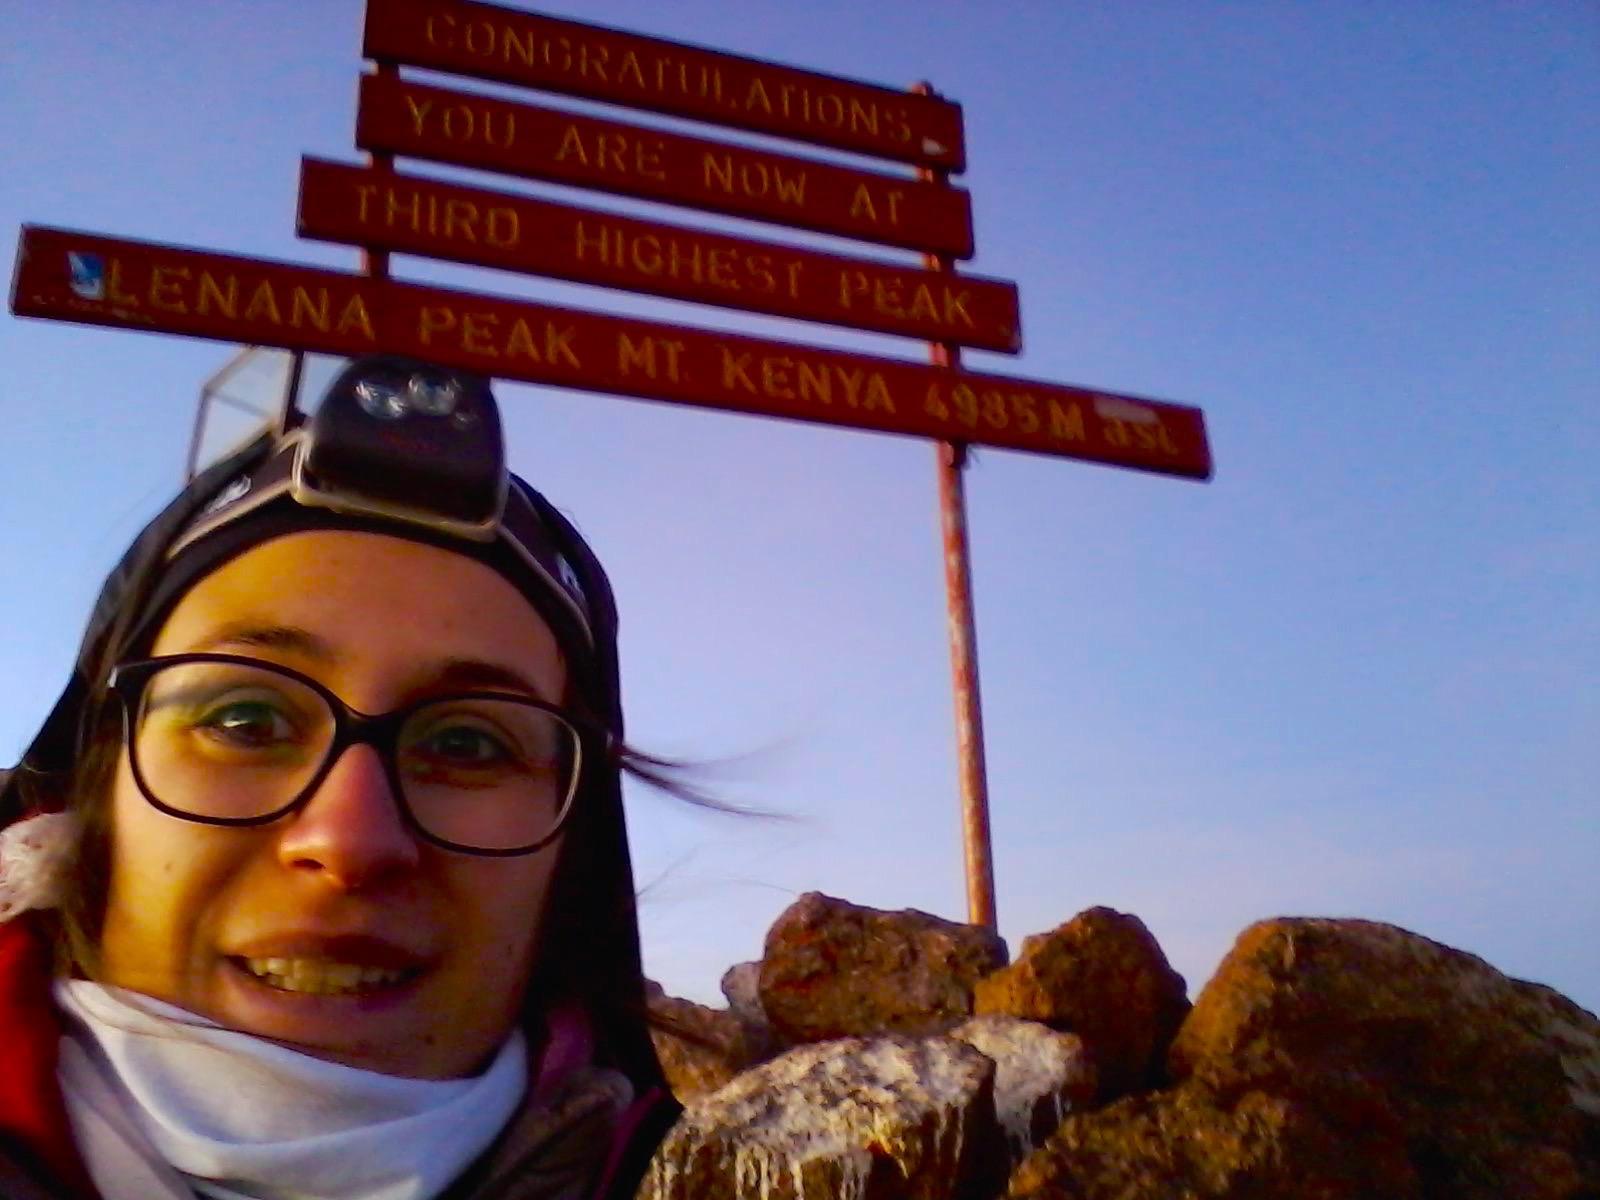 Selfie Mont Kenya – 4985m